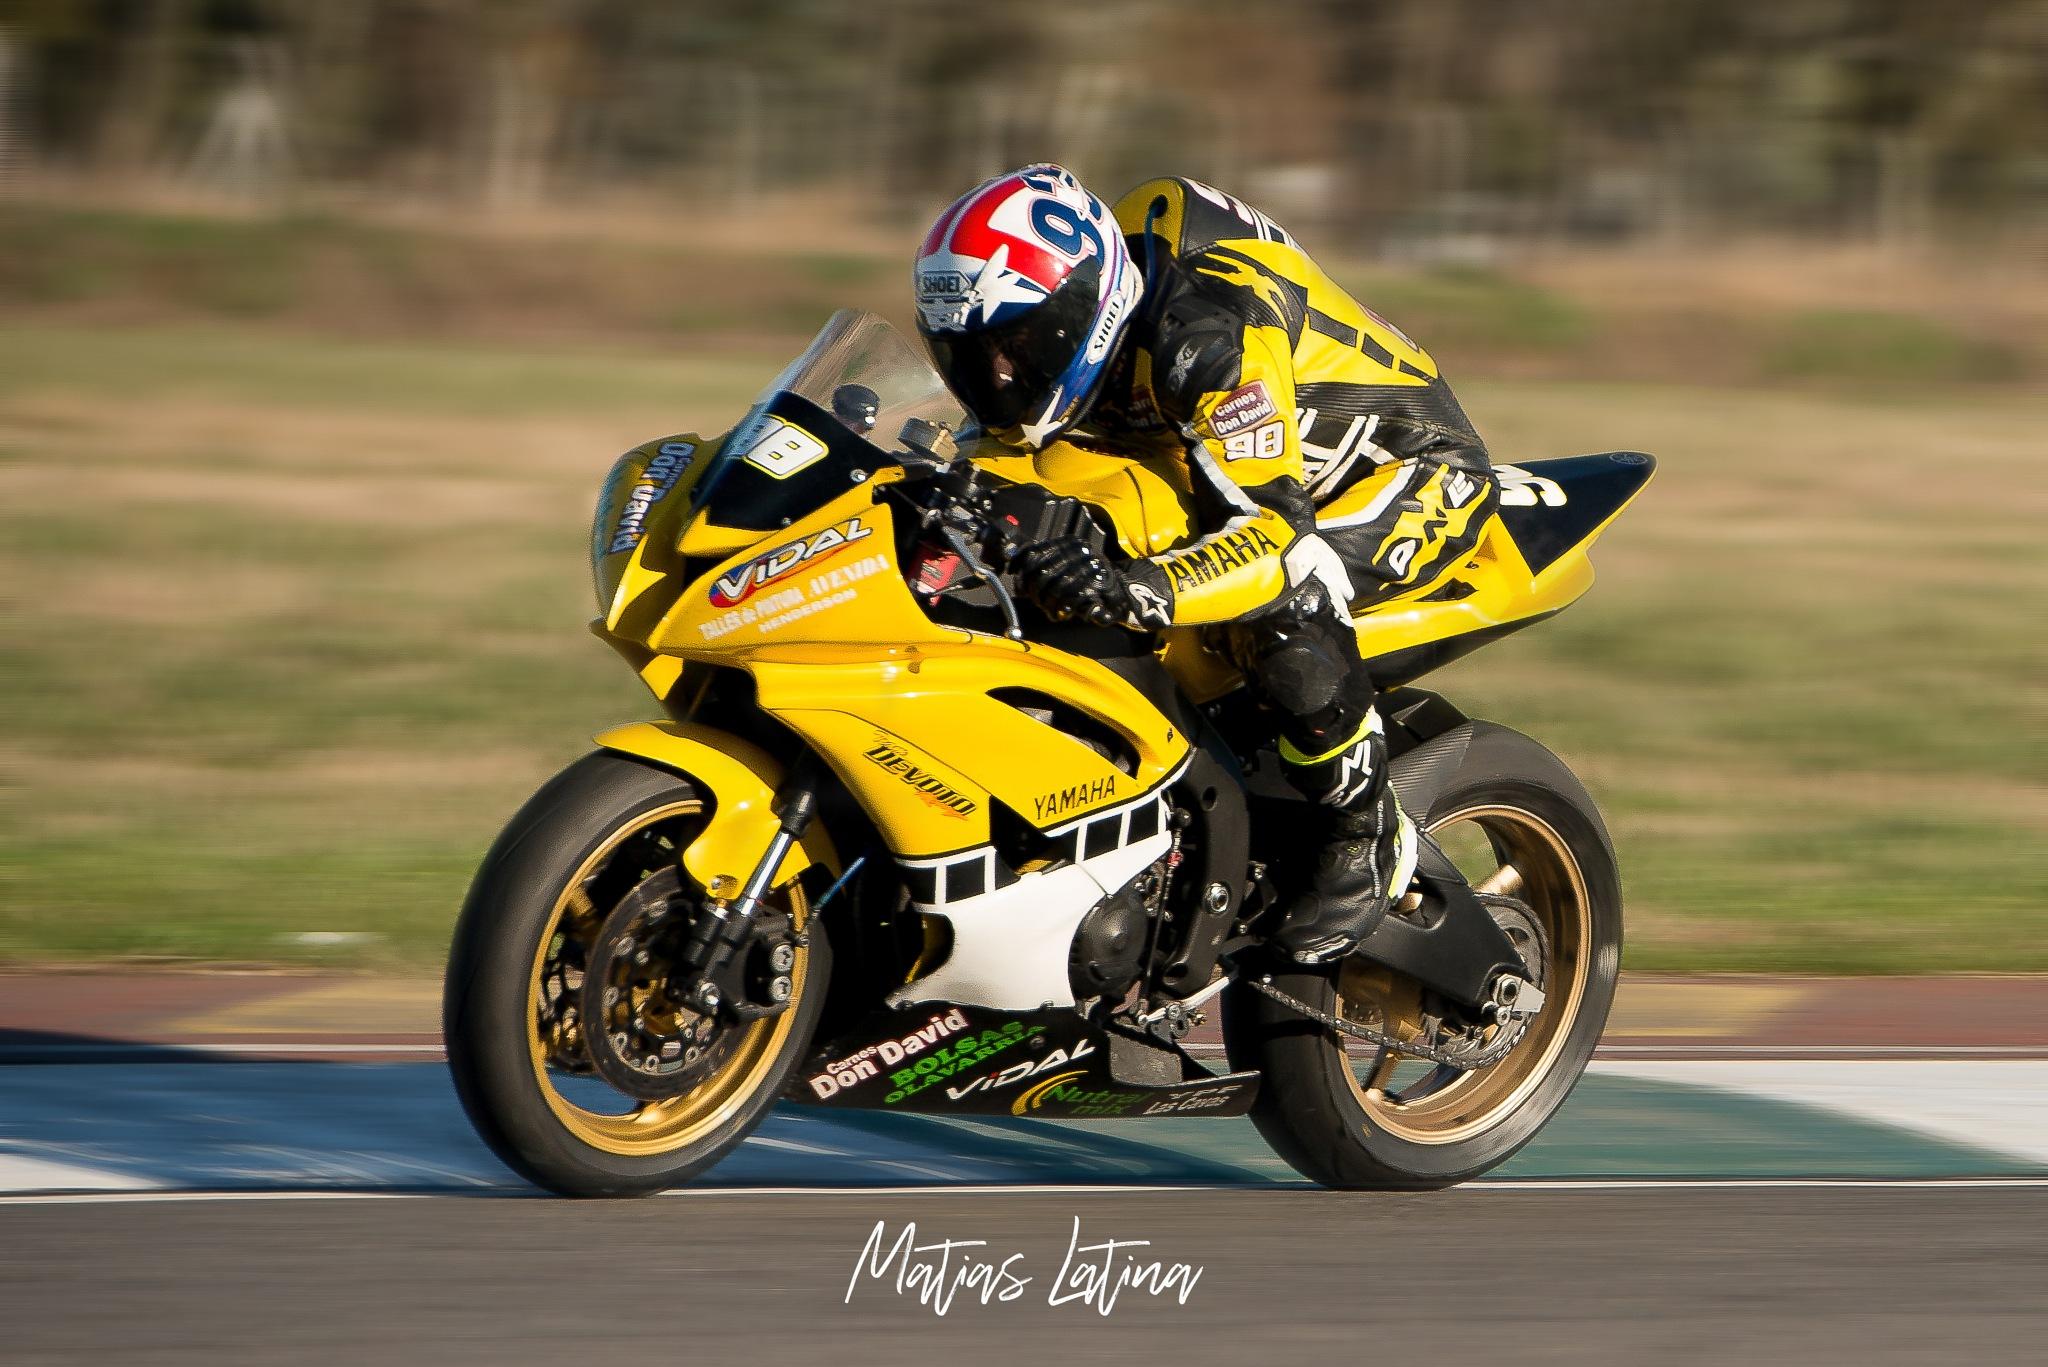 Motorcycling by Matias Latina